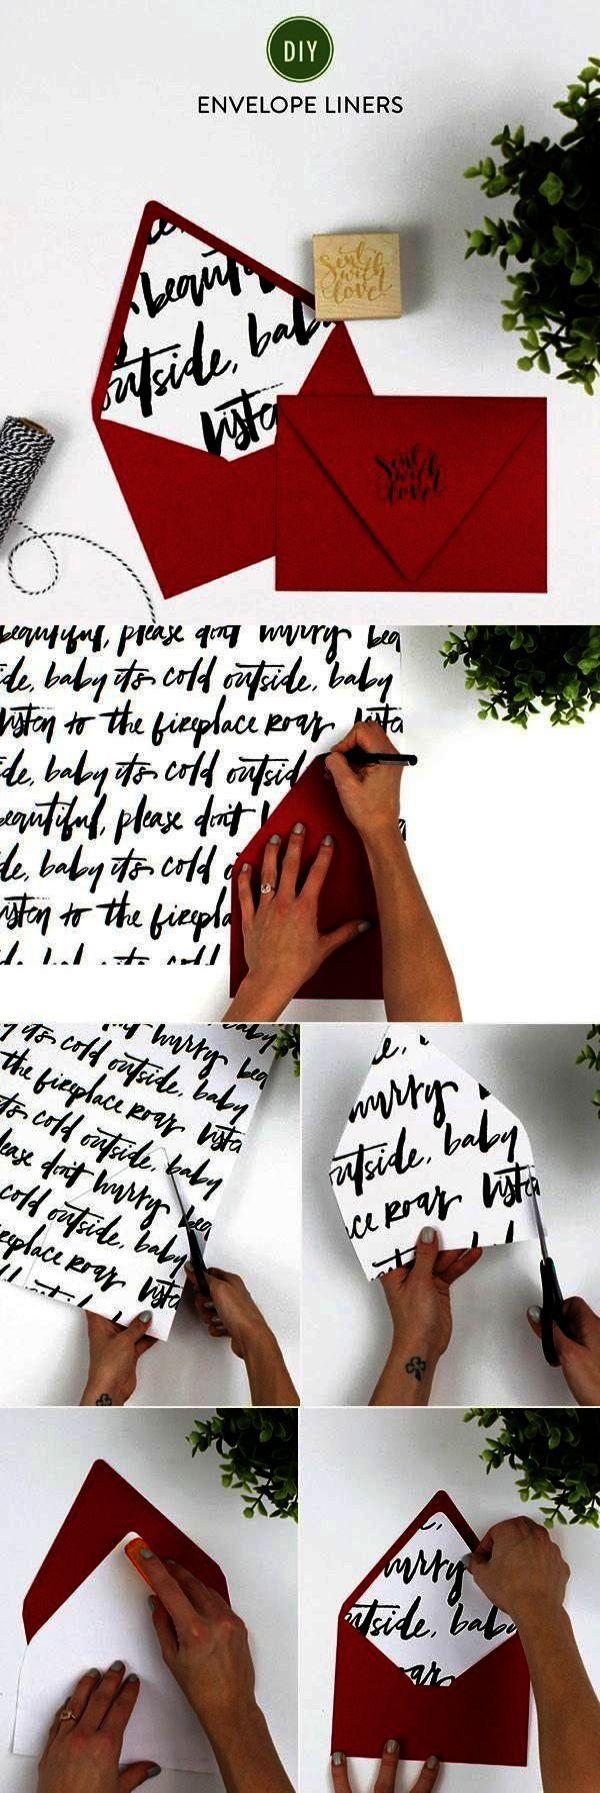 Wedding Invitations Cards DIY Wedding Invitations Brown Paper ...